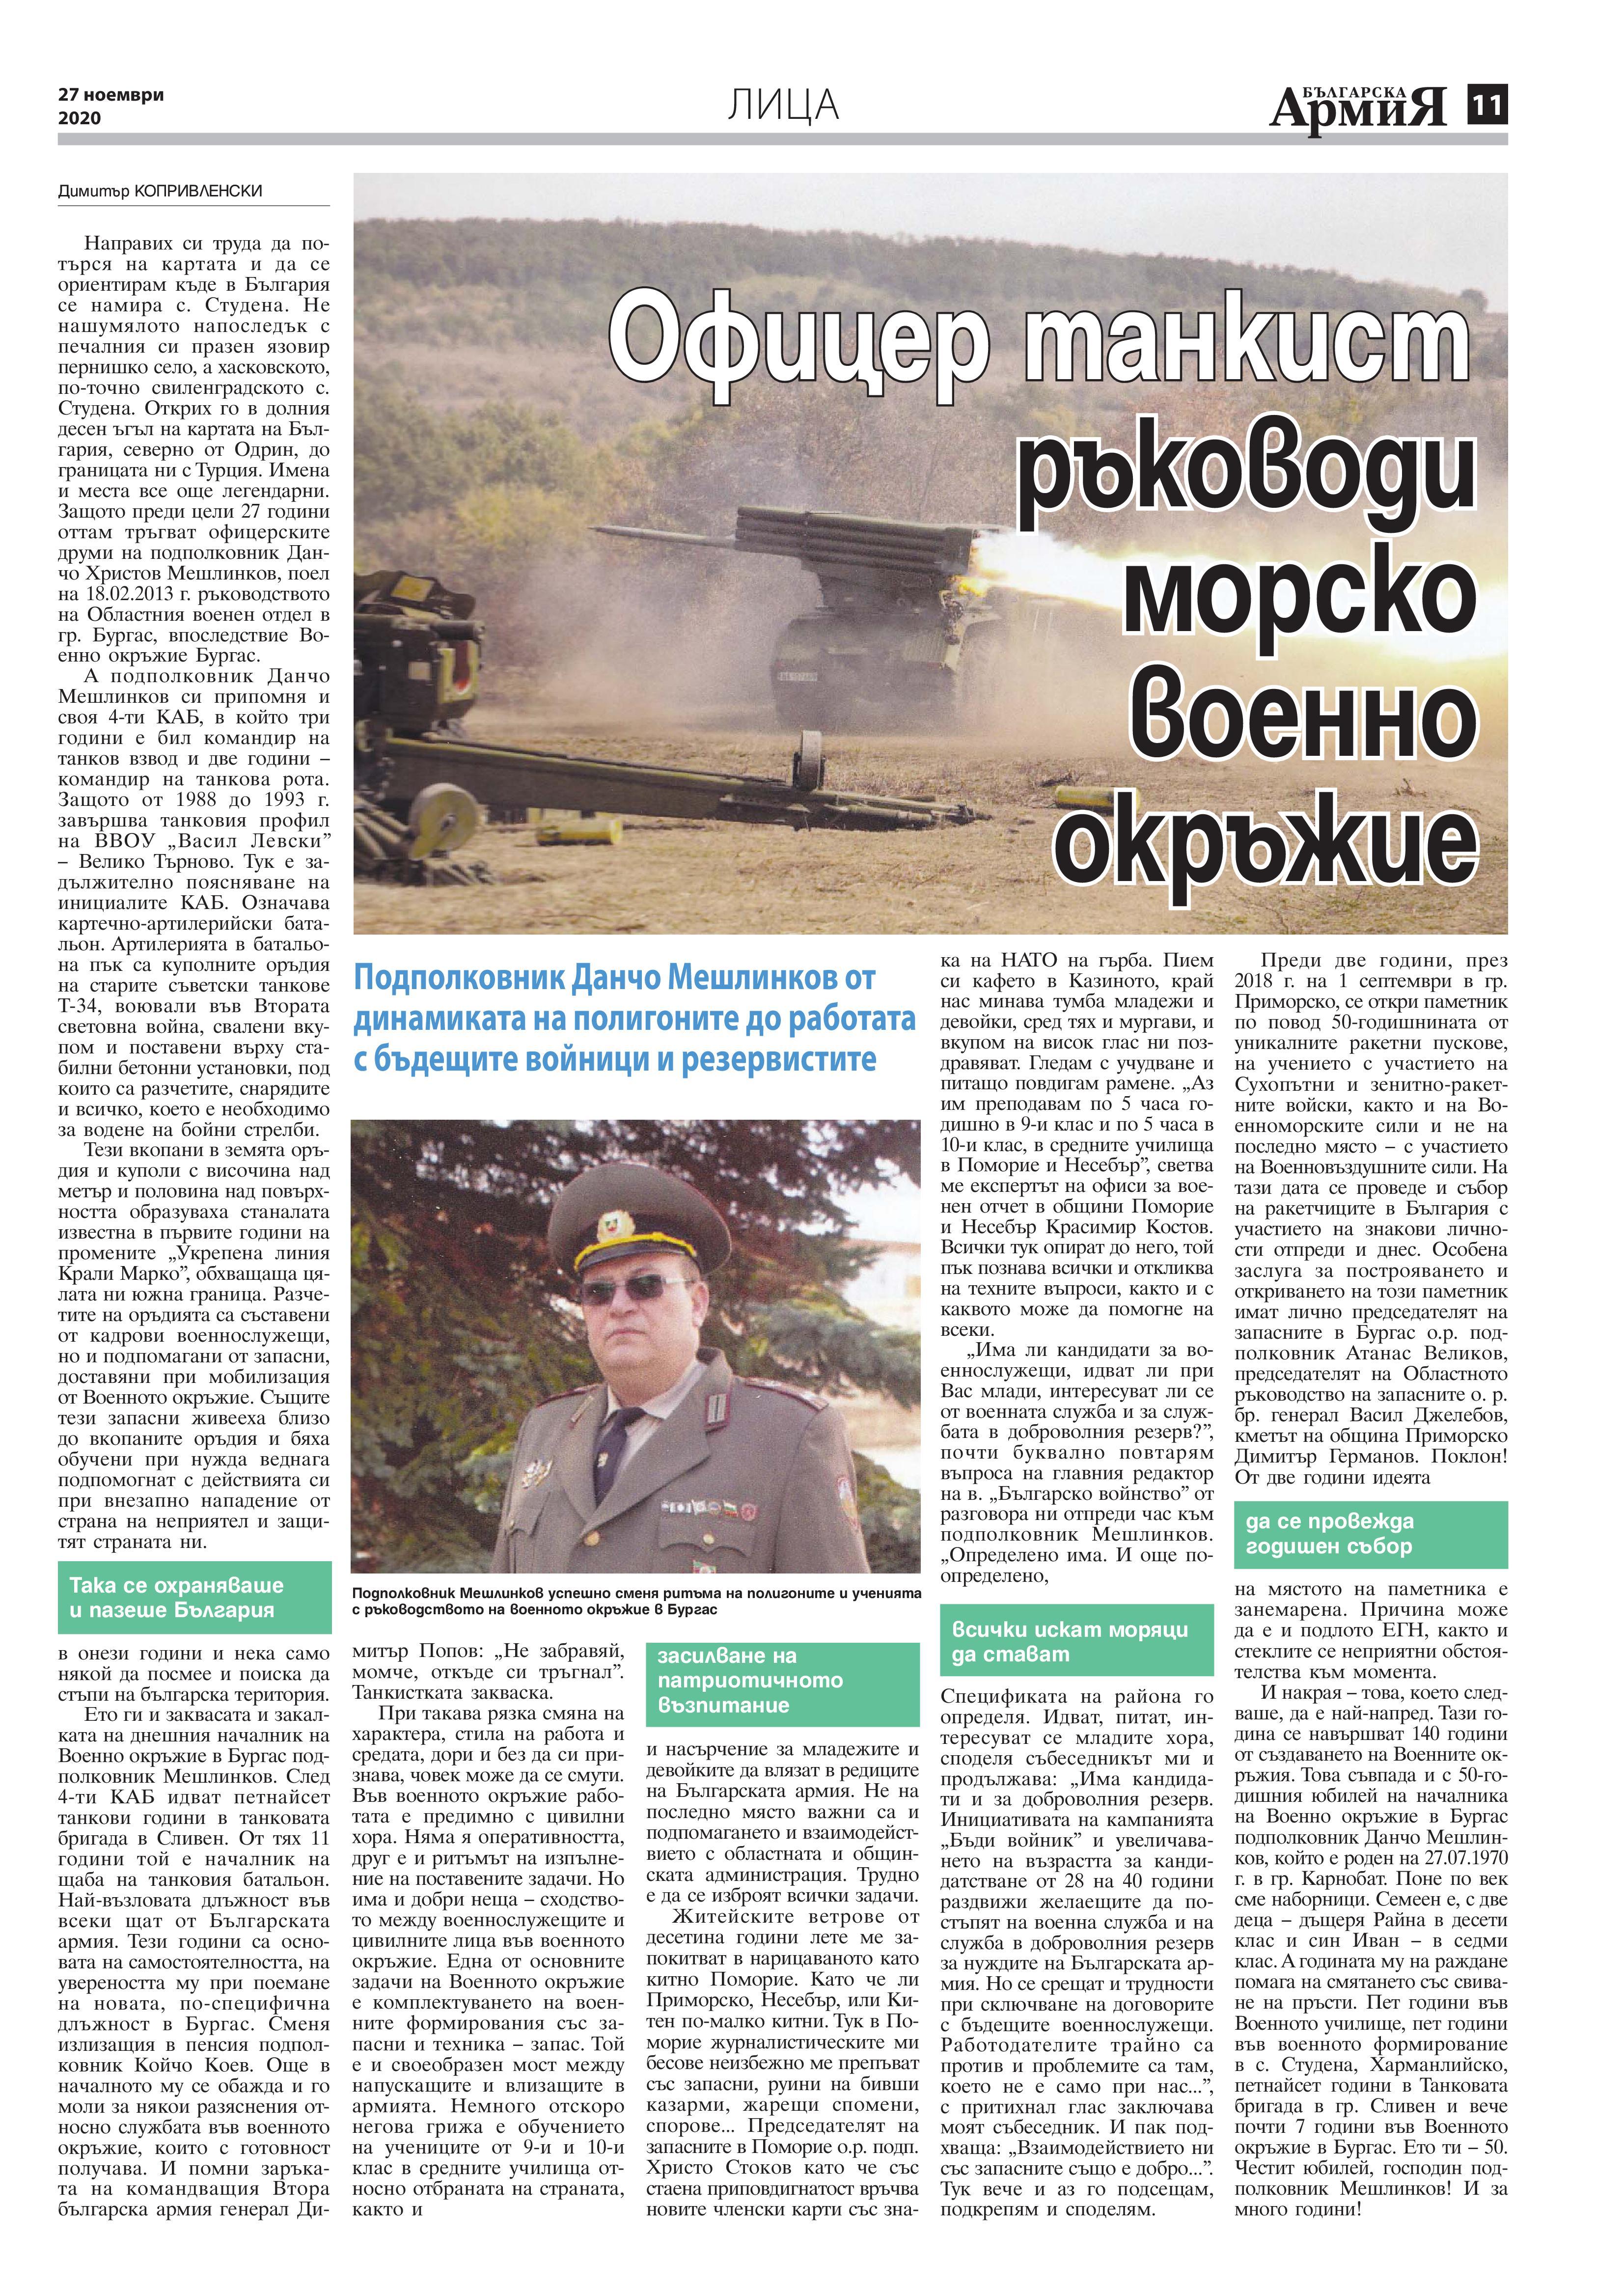 https://www.armymedia.bg/wp-content/uploads/2015/06/11-50.jpg